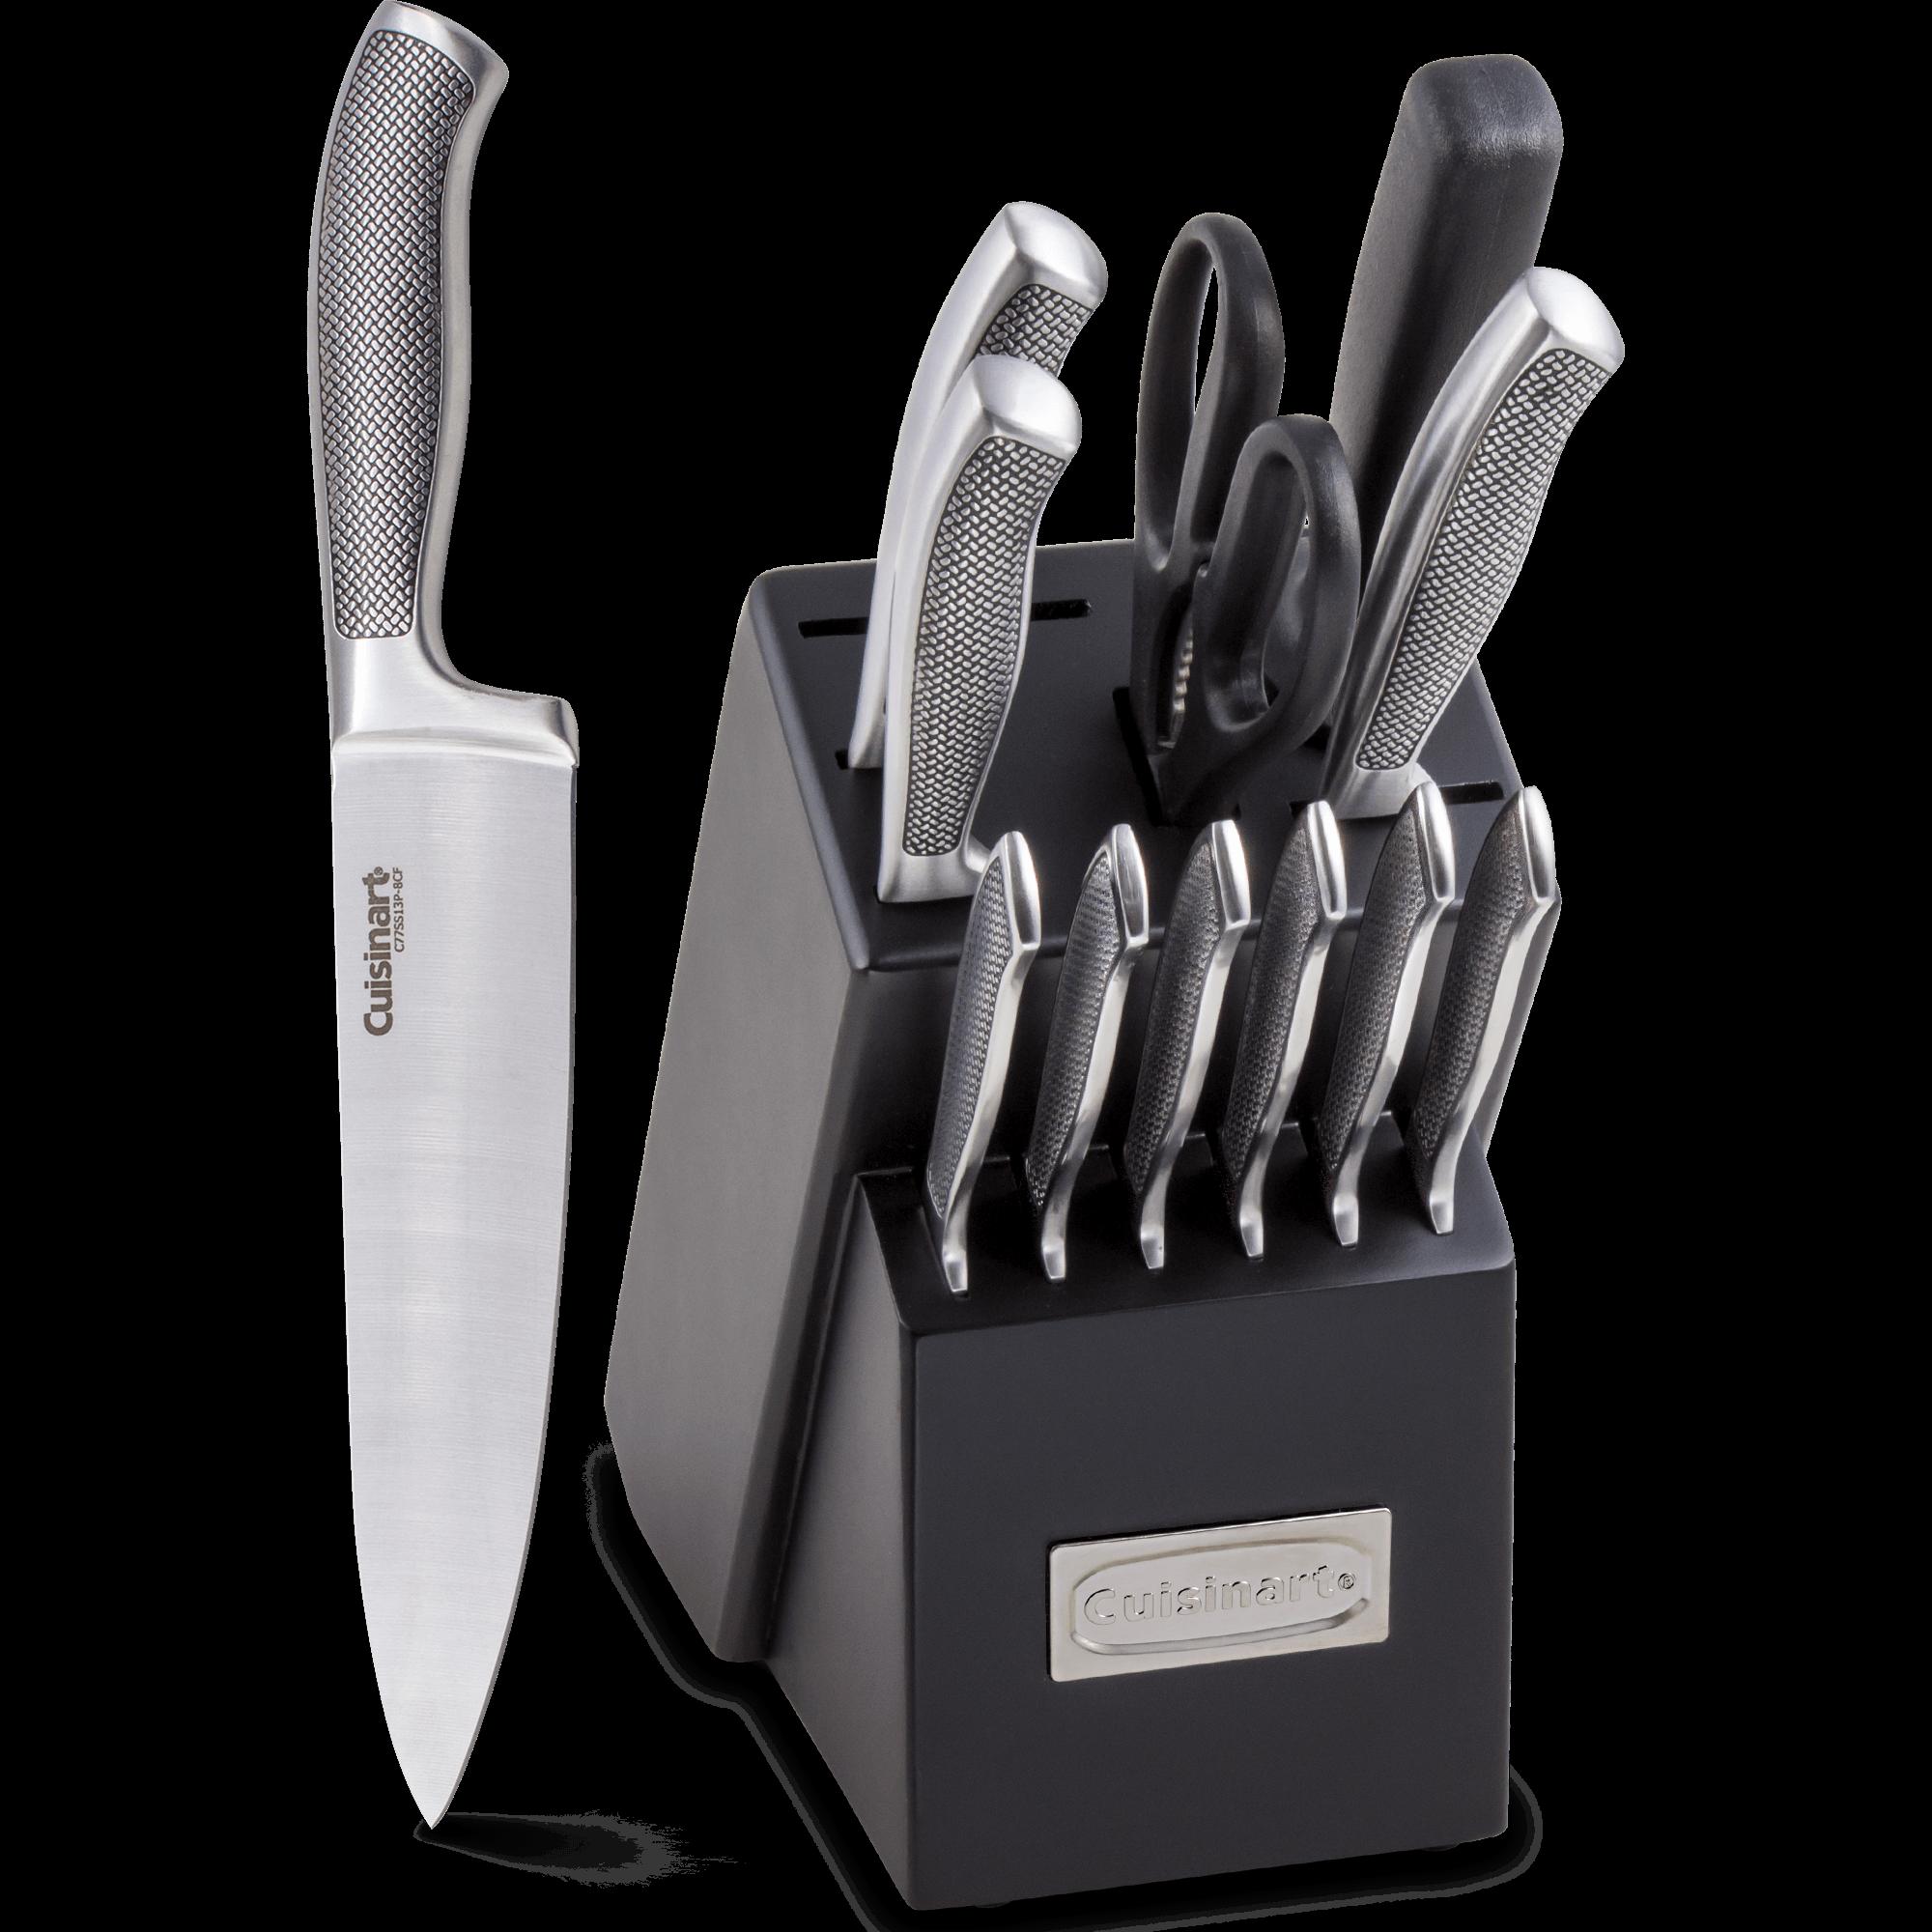 Cuisinart 13 Piece Graphix Collection Knife Block Set